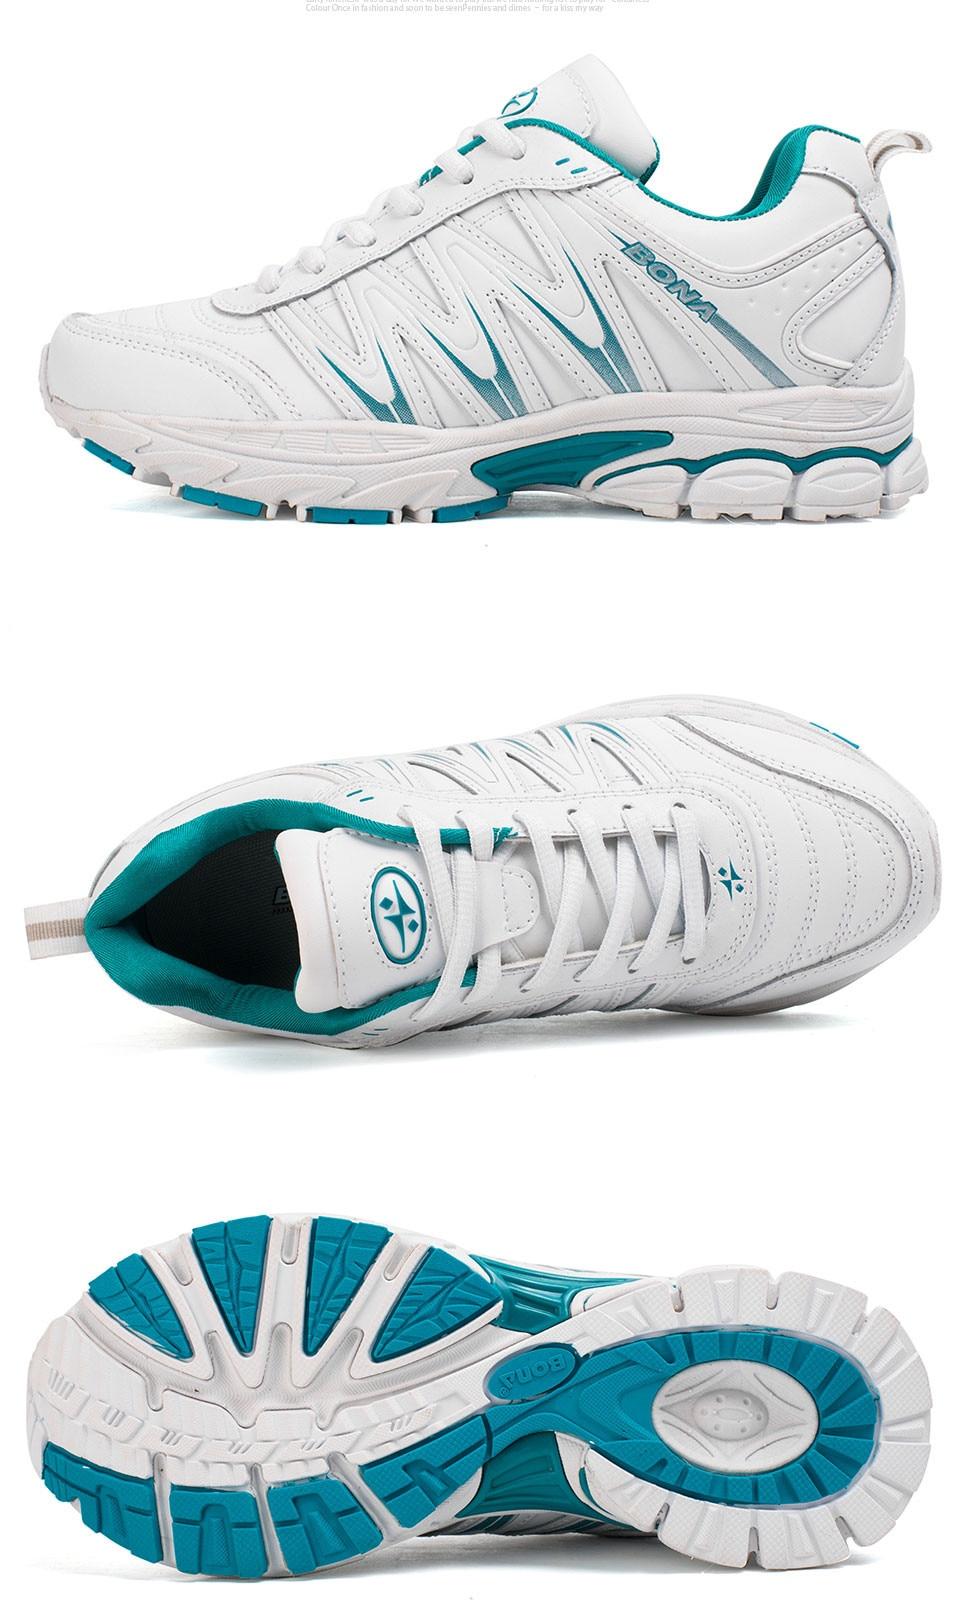 H80c584b31c474308847806de8673869dR BONA 2019 New Designers Casual Shoes Men Style Cow Split Sneakers Male Lightweight Outdoor Fashion Footwear Man Trendy Comfy